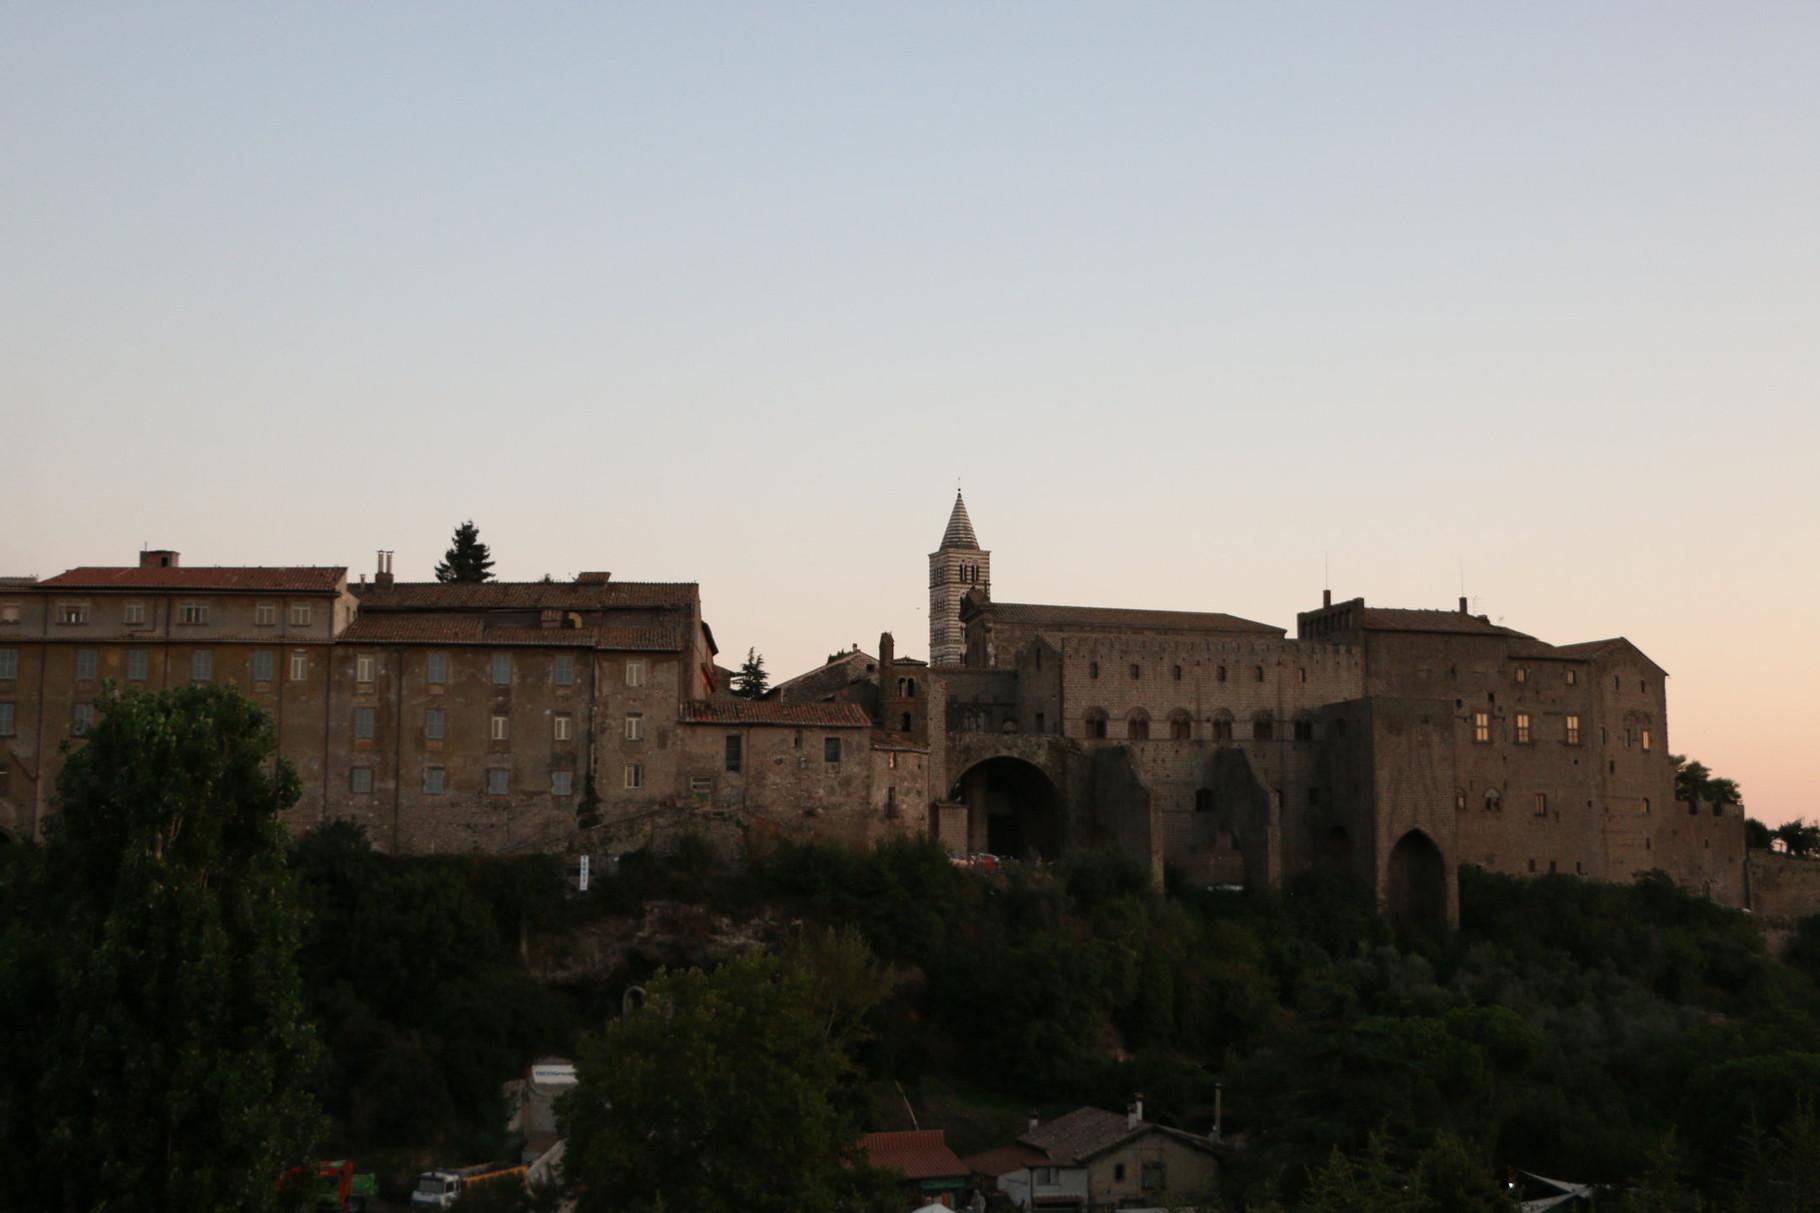 Tappa 39: Montefiascone - Viterbo | 17,9 km